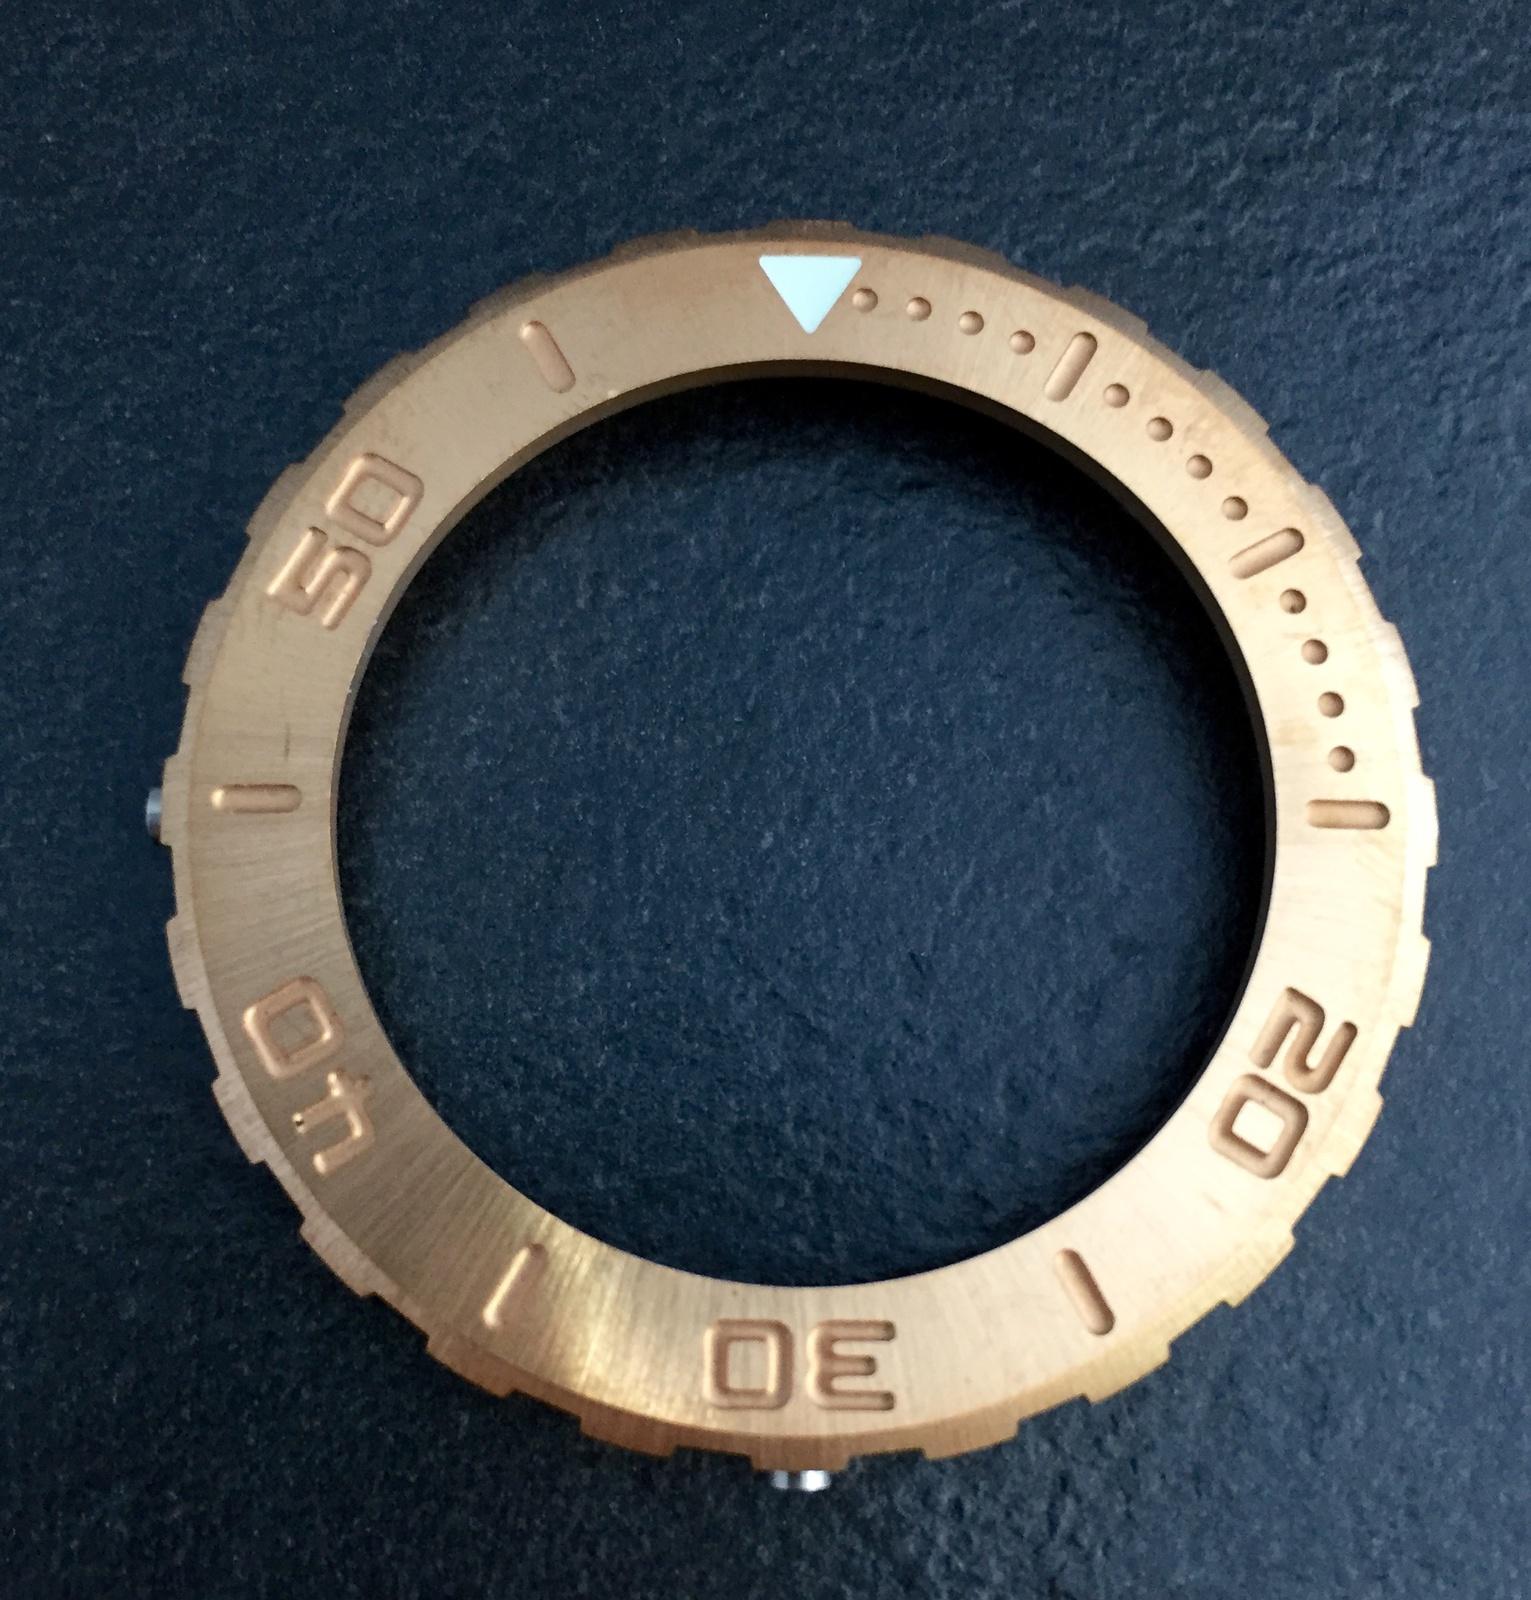 Erledigt] Bronze Lünette für KALMAR 1 H2O - UhrForum